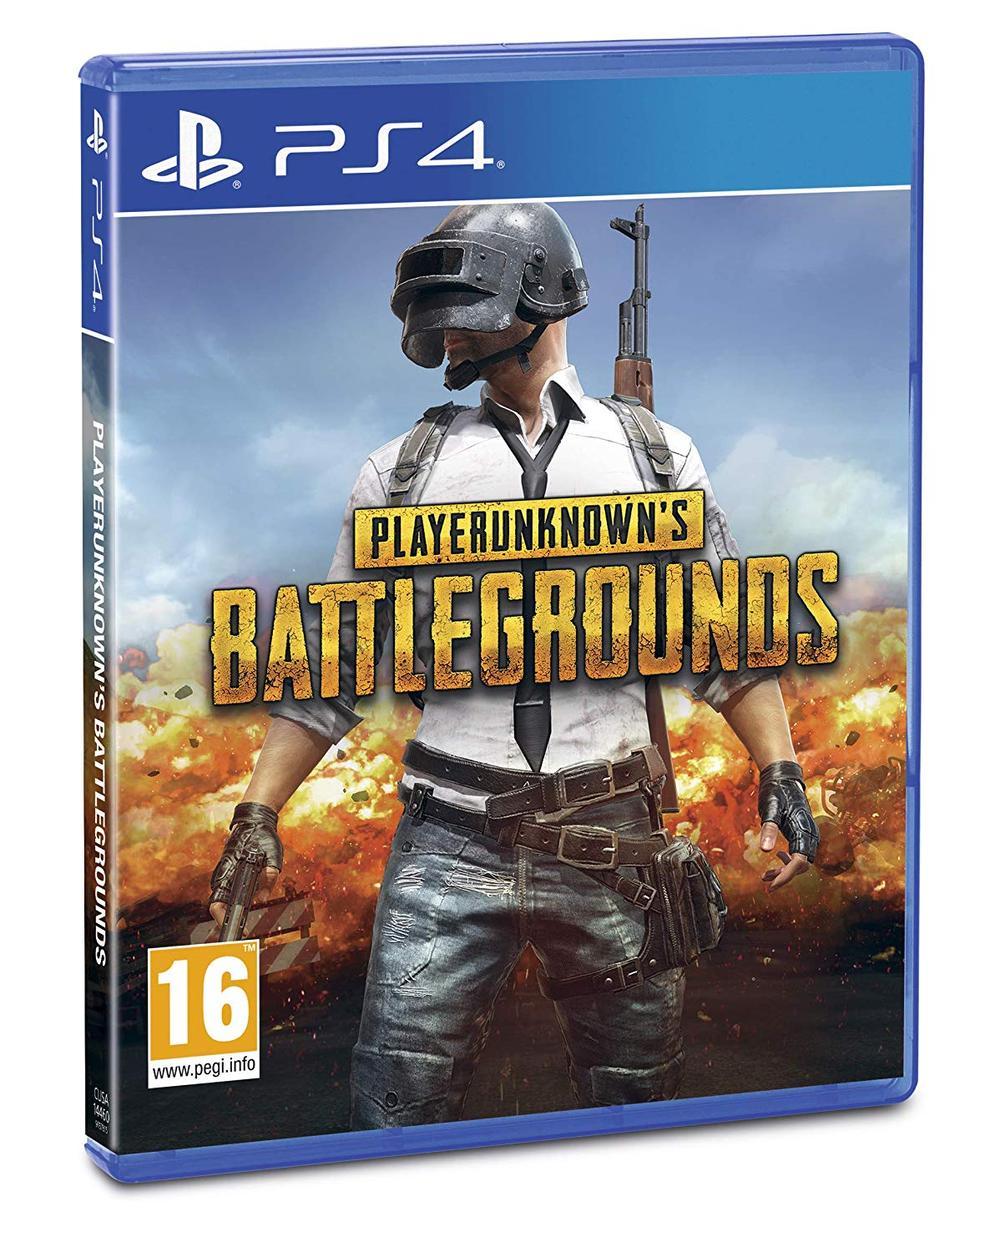 https://m2.mestores.com/pub/media/catalog/product/p/l/playerunknown_s_battlegrounds_1.jpg